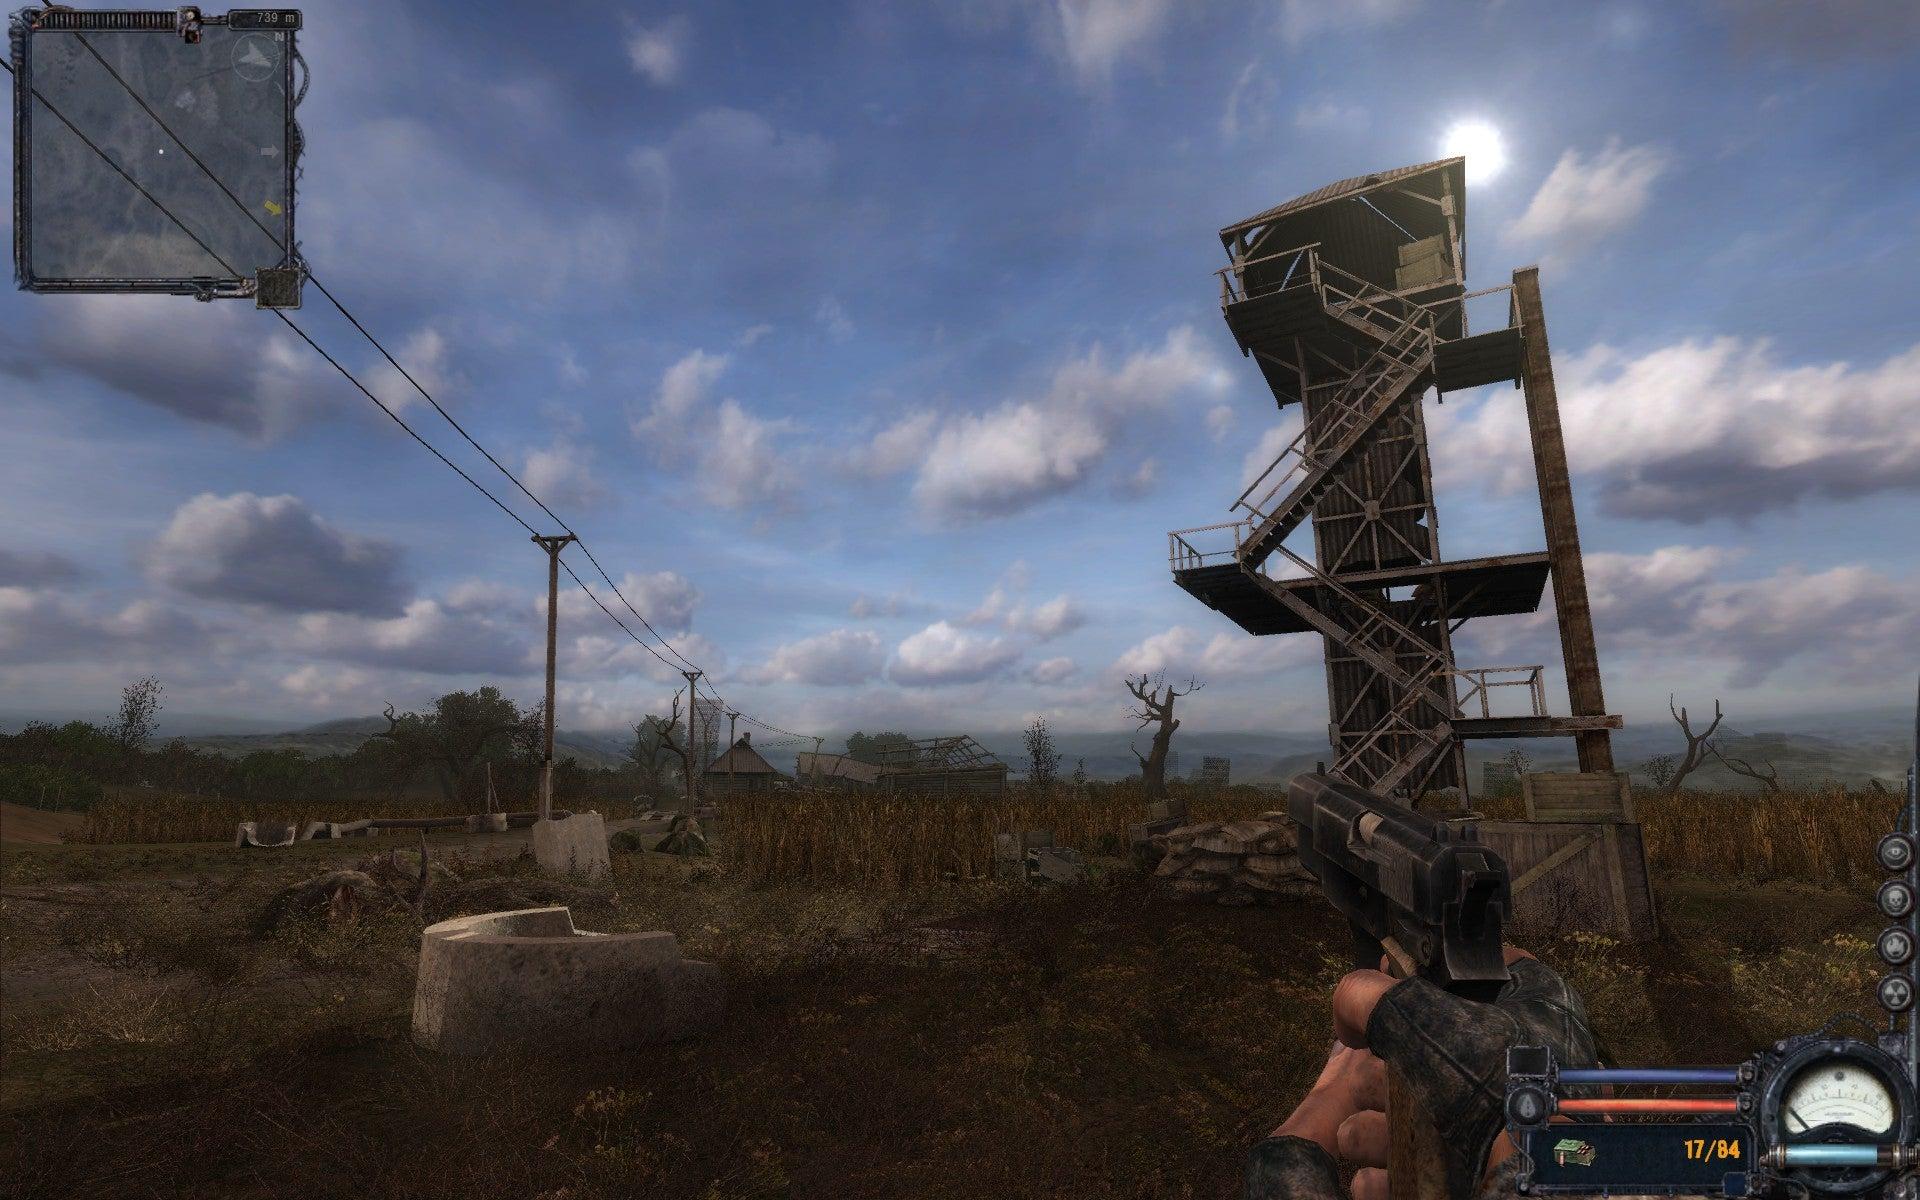 Most Survival Games Have Problems That S.T.A.L.K.E.R. Solved Long Ago